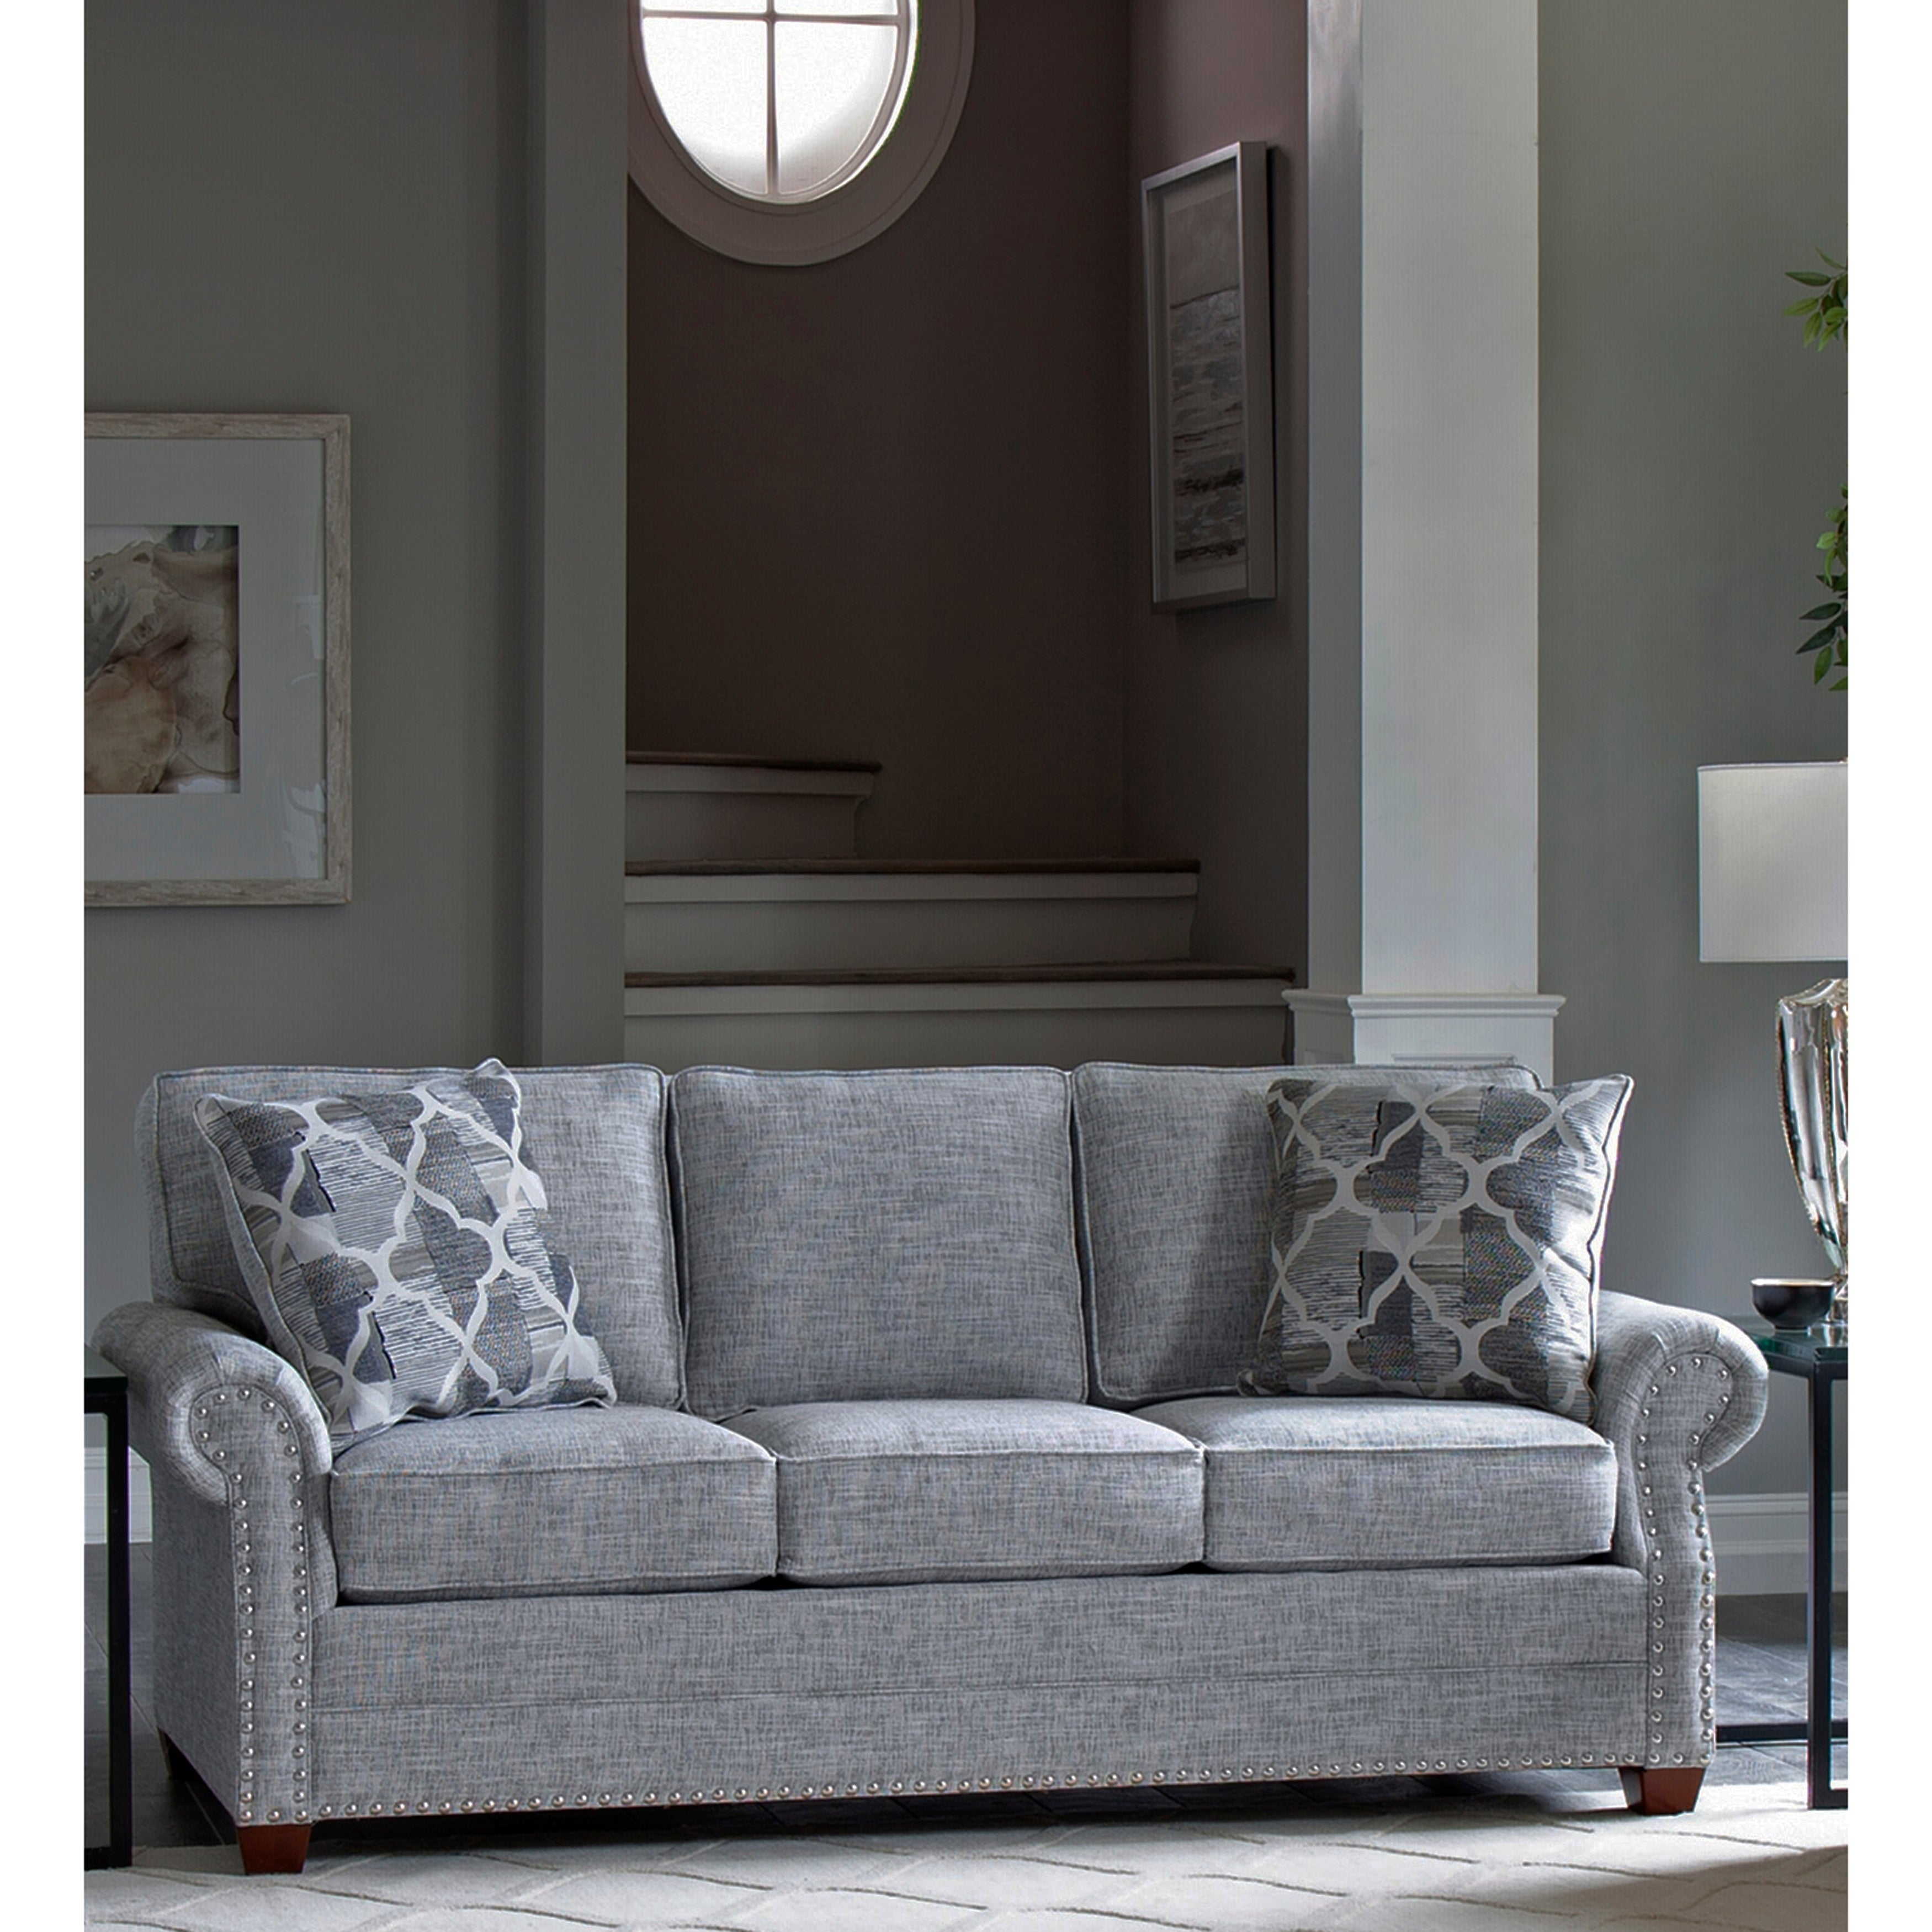 Usa Marner Grey Fabric Sofa Bed